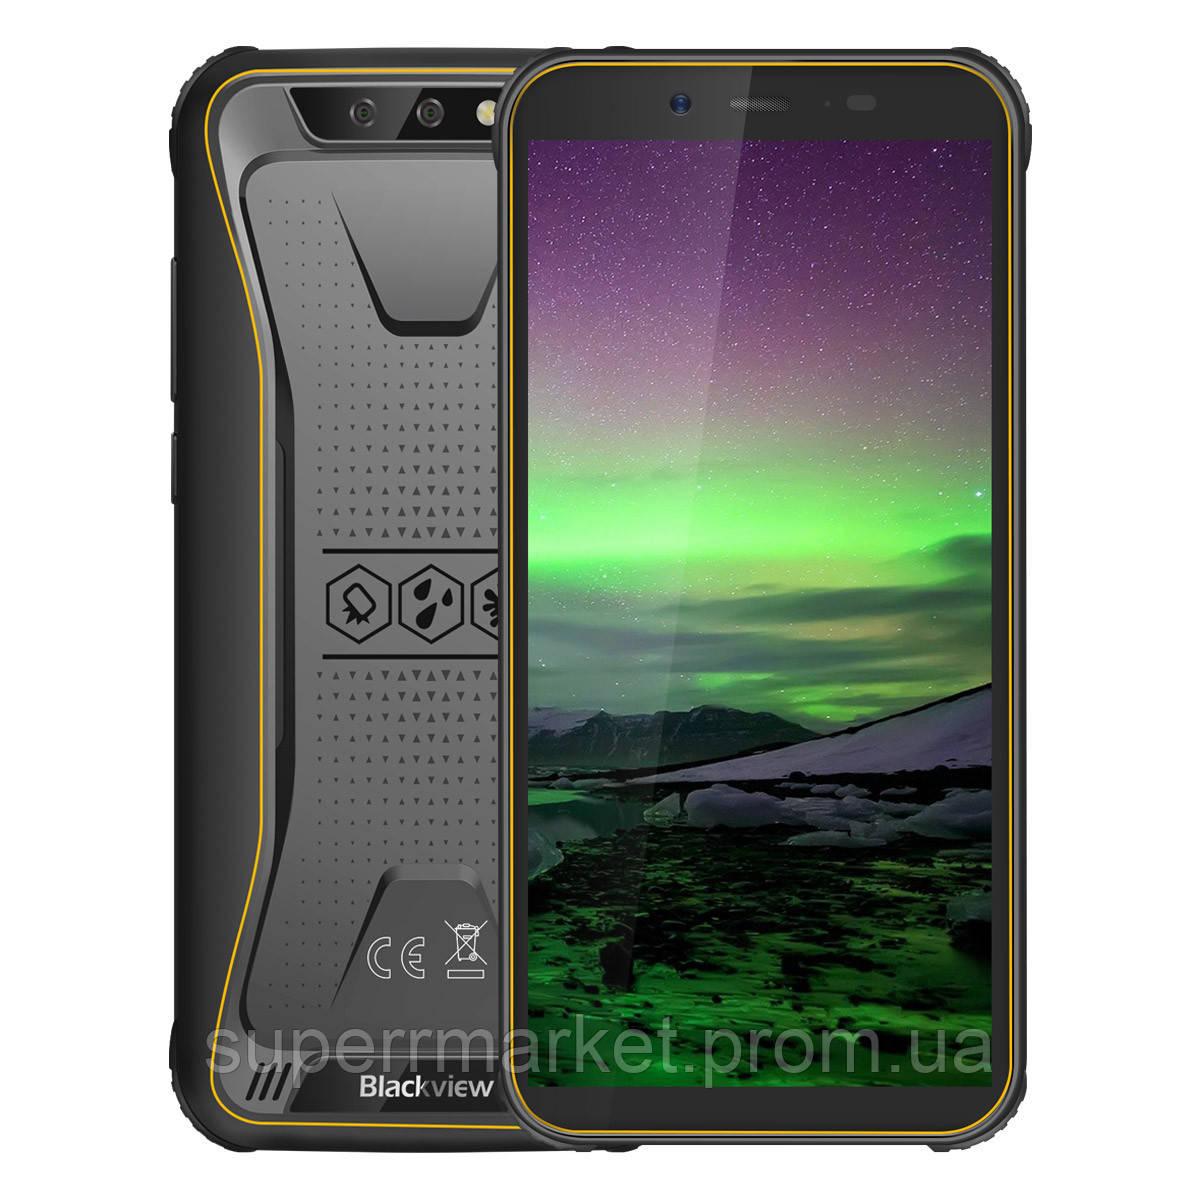 Смартфон Blackview BV5500 16GB Yellow